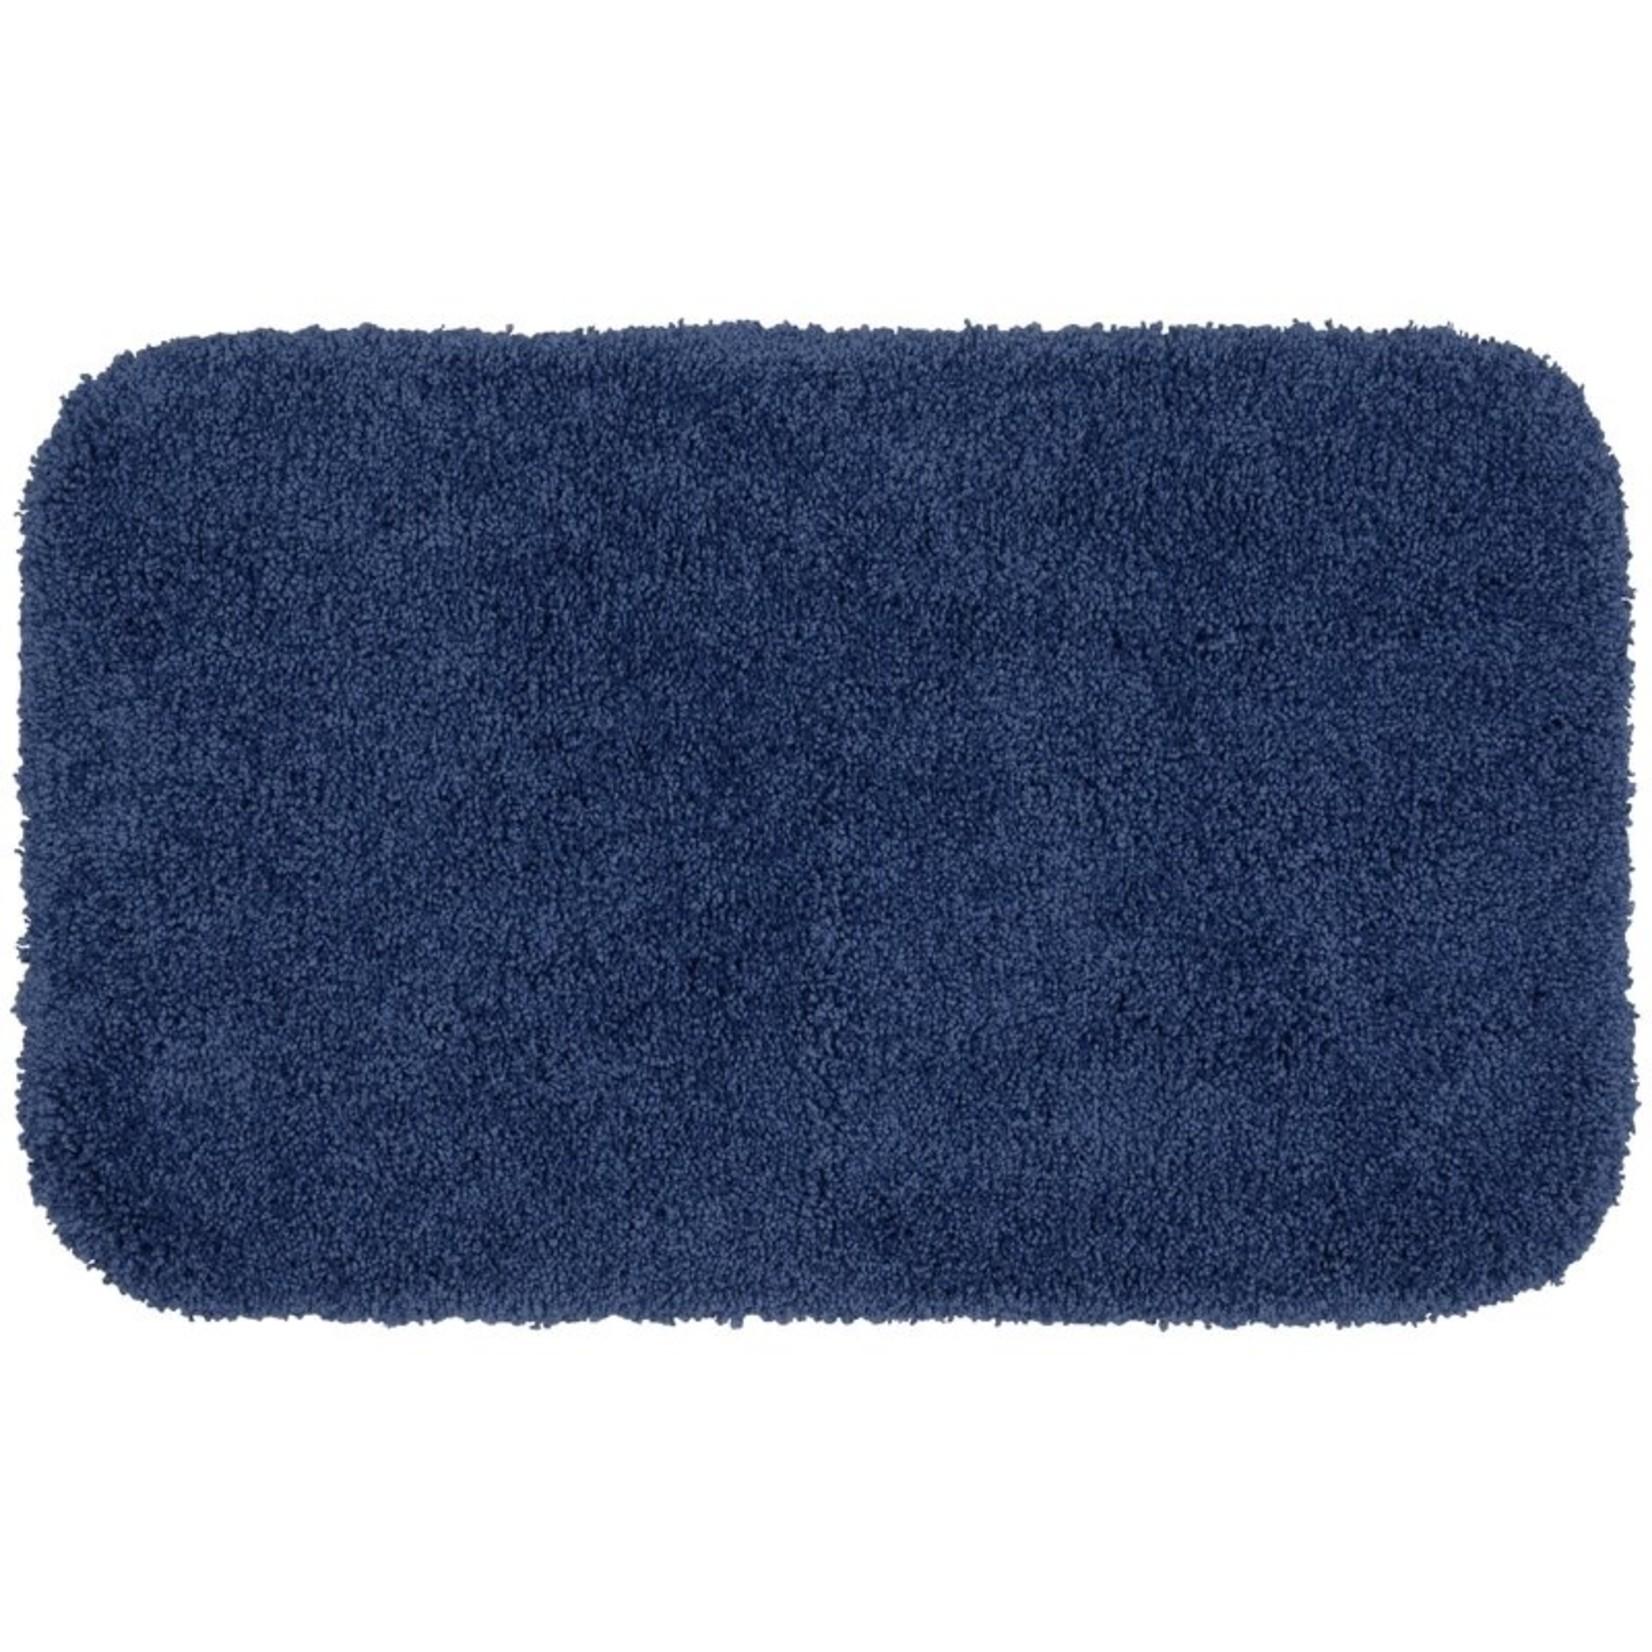 "*30"" x 50"" Billie-Mae Rectangle Nylon Non-Slip Bath Rug - Navy"